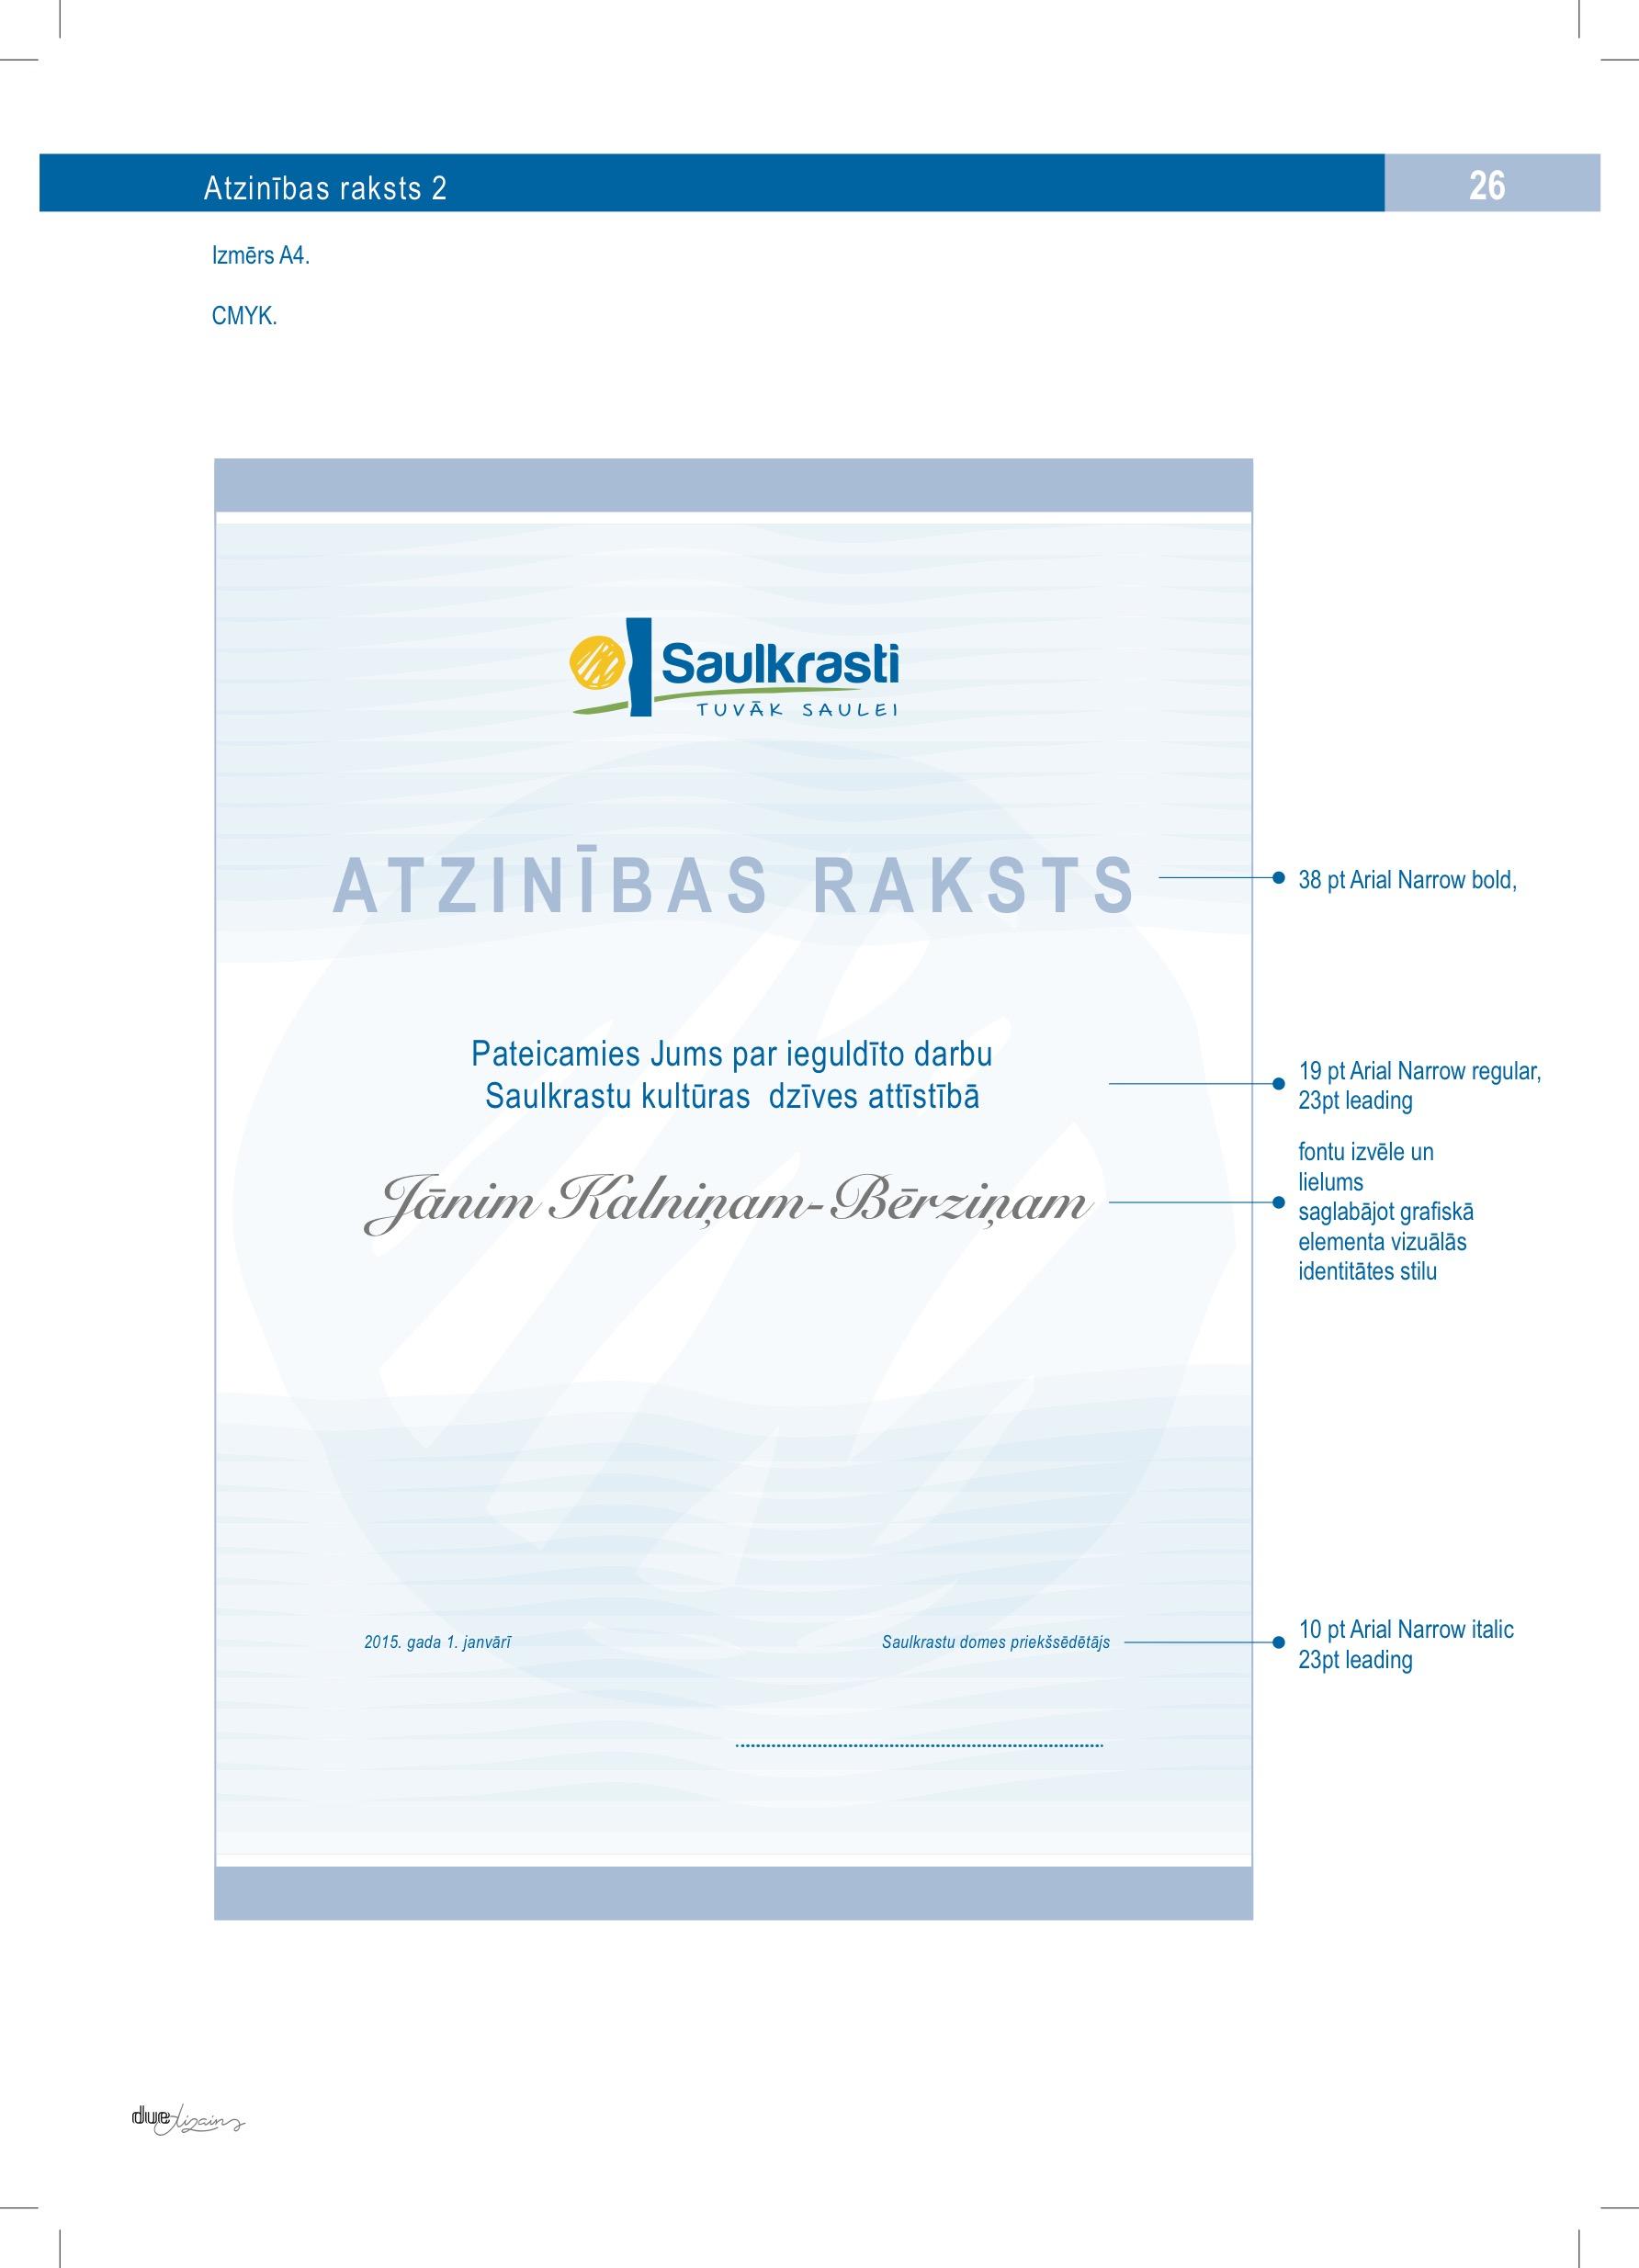 saulkrasti-print 28